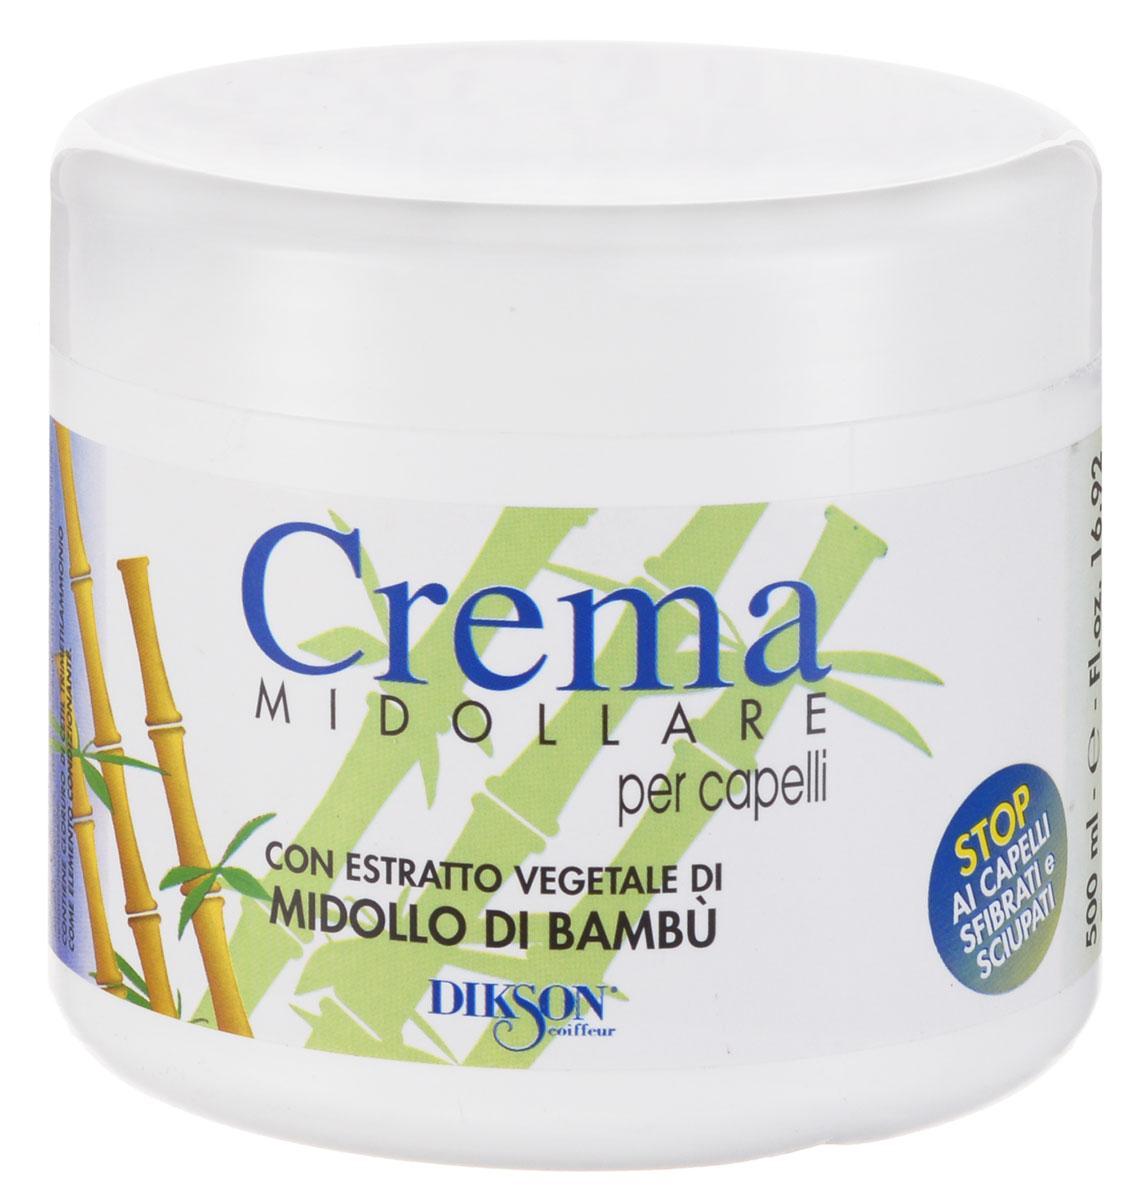 Dikson Восстанавливающий бальзам с экстрактом бамбука Crema Midollare Bambu 500 мл dikson восстанавливающий бальзам с экстрактом бамбука dikson masks crema midollare bambu 850 500 мл